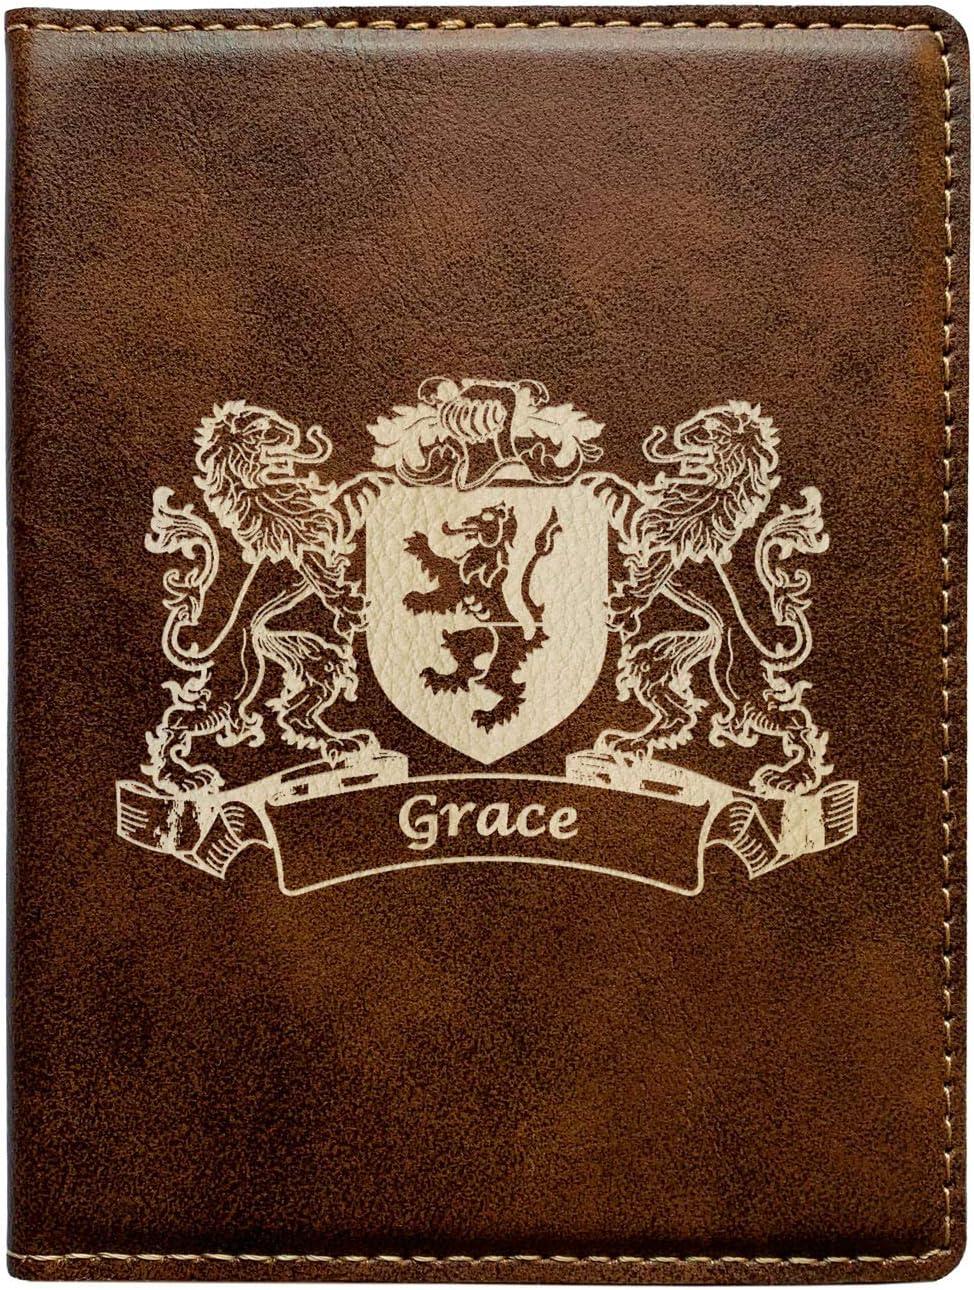 Grace Irish Coat of Arms Leather Passport Wallet